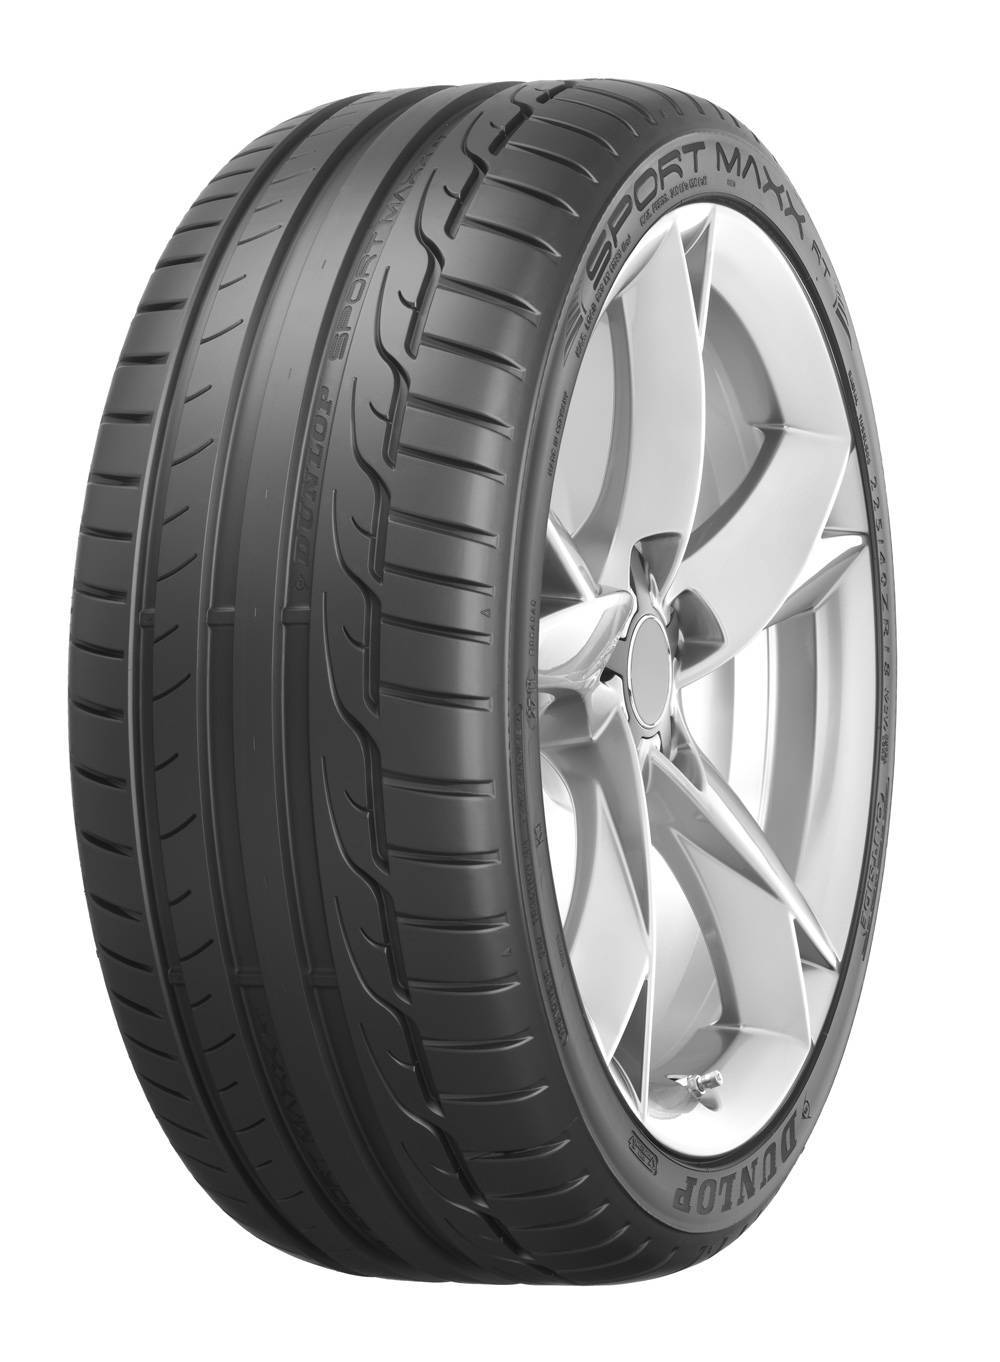 Pneu Dunlop Sp Sport Maxx Xl 225/40 R19 93y